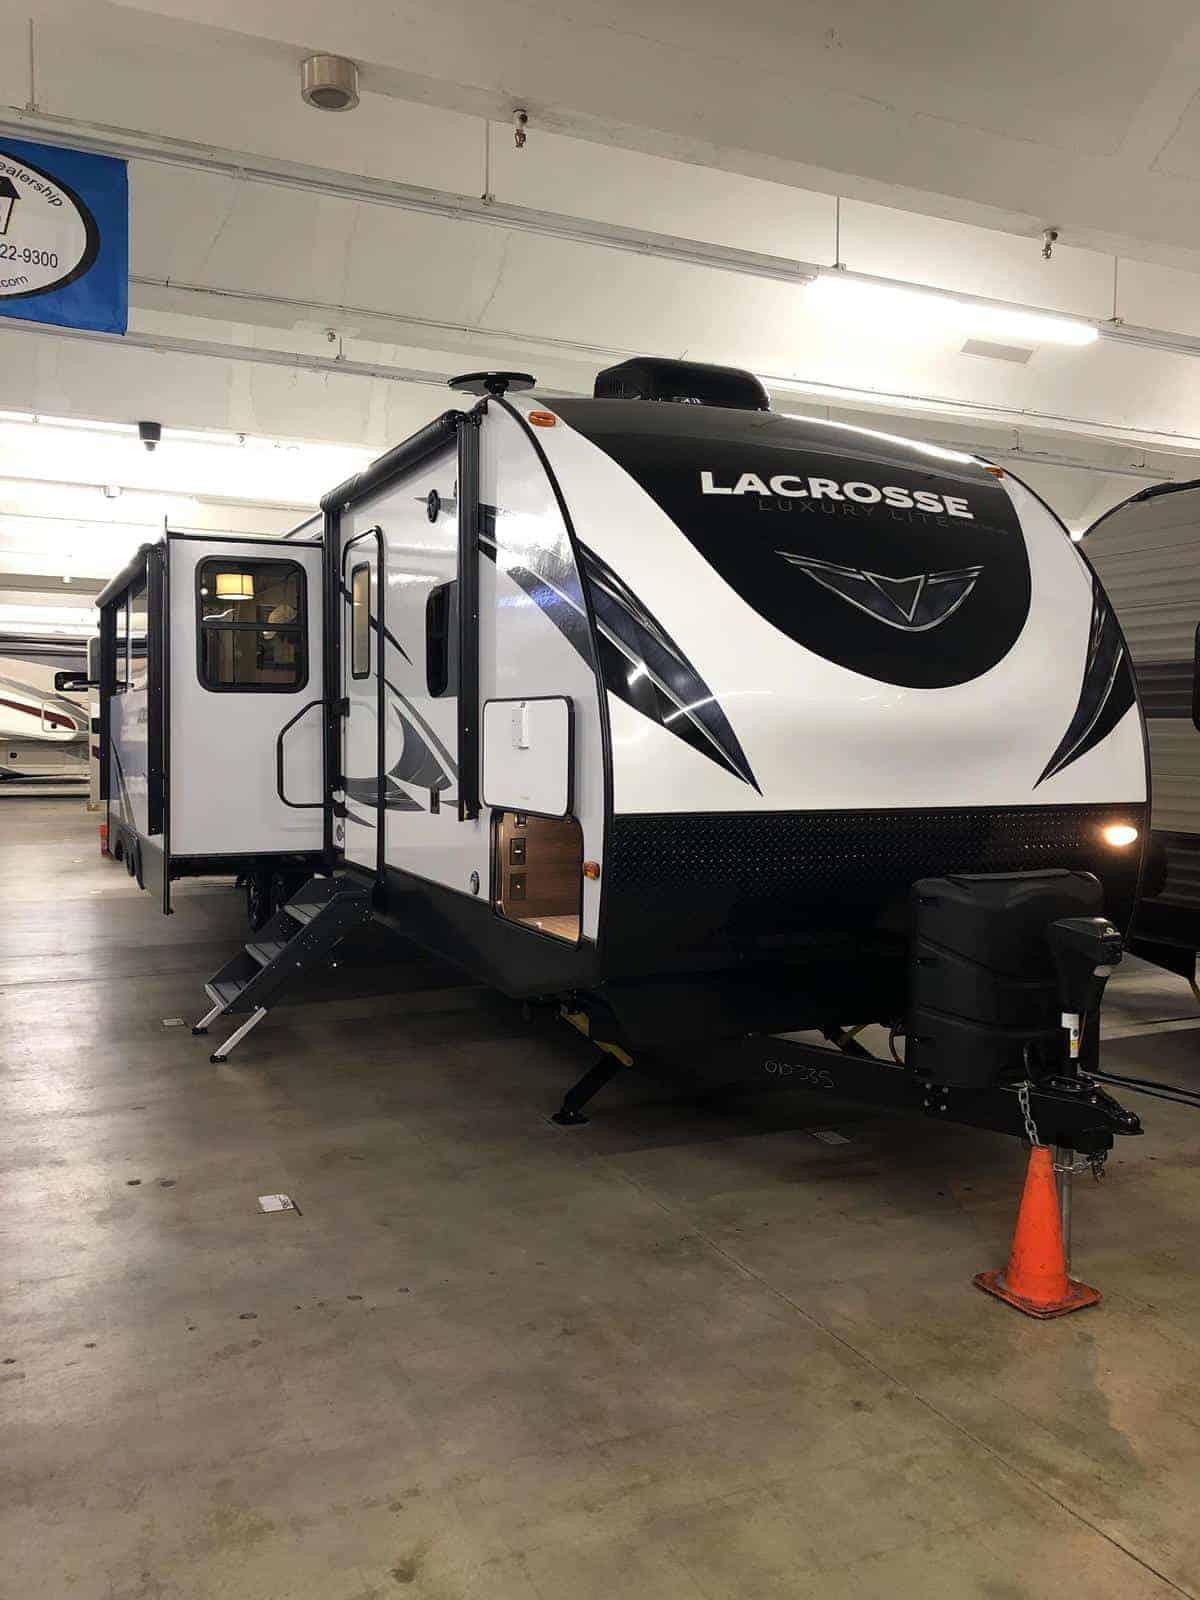 NEW 2019 Prime Time LACROSSE 3380IB - Three Way Campers